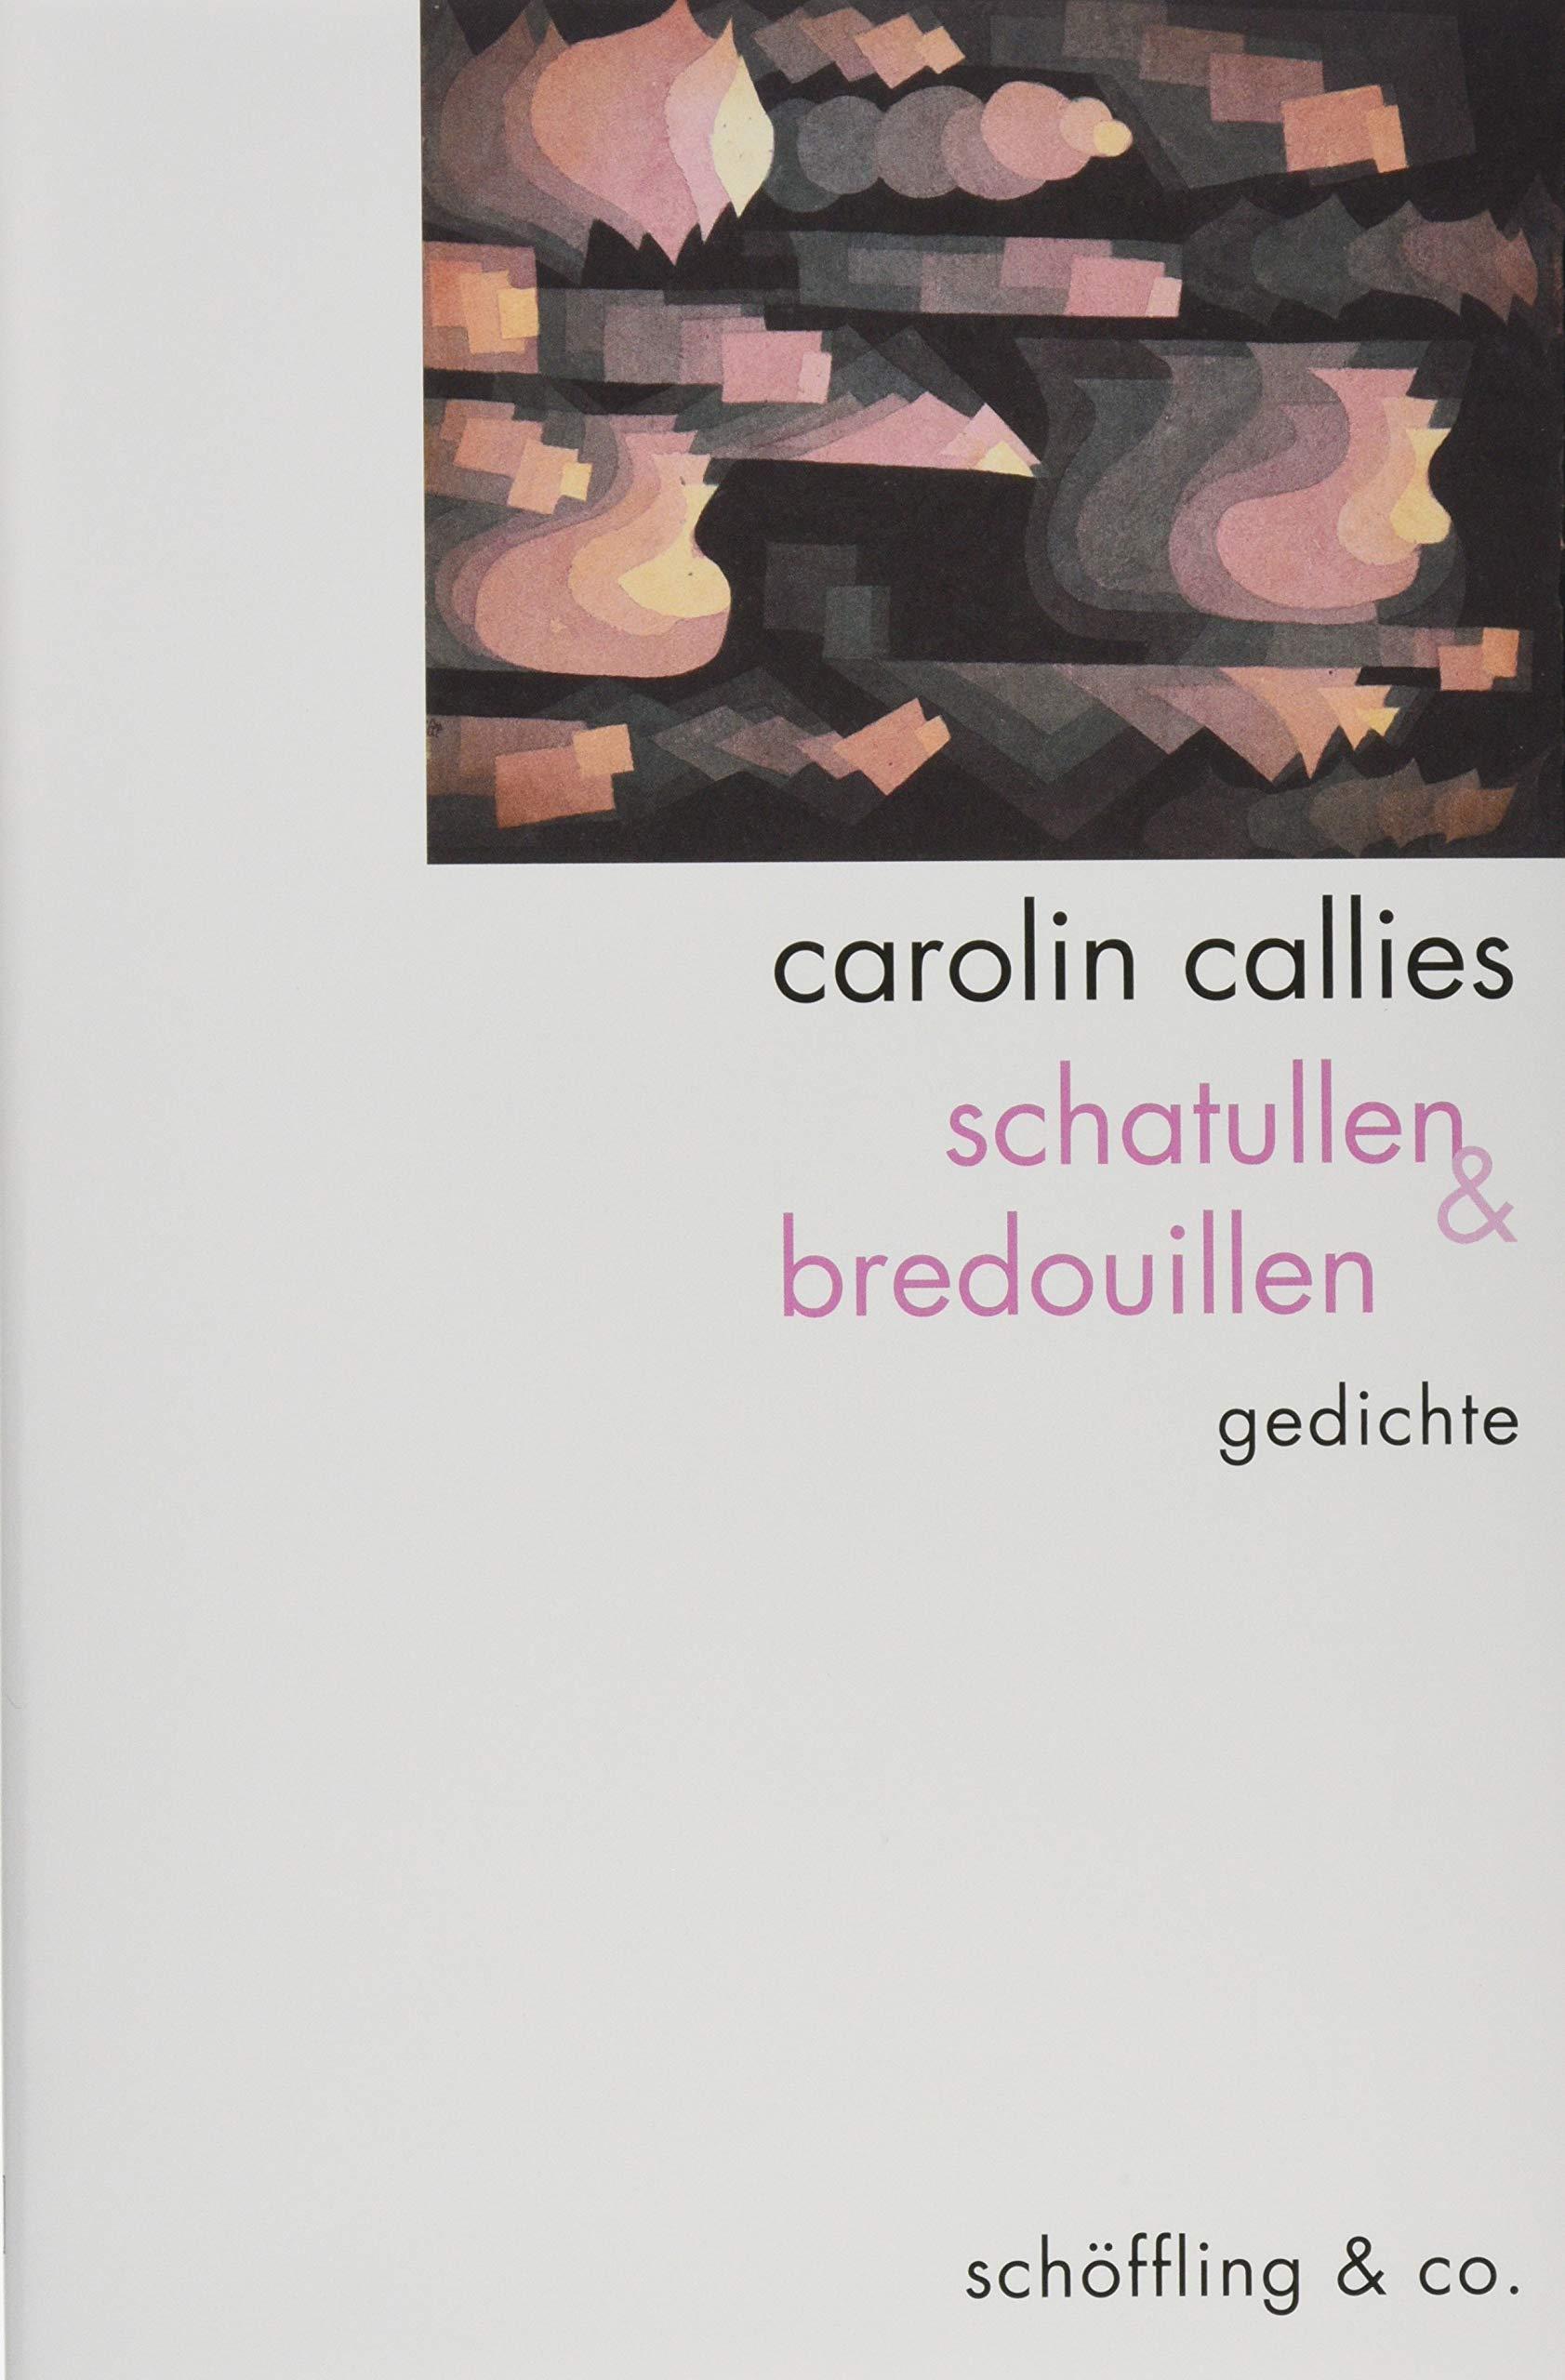 Schatullen Bredouillen Gedichte Amazonde Carolin